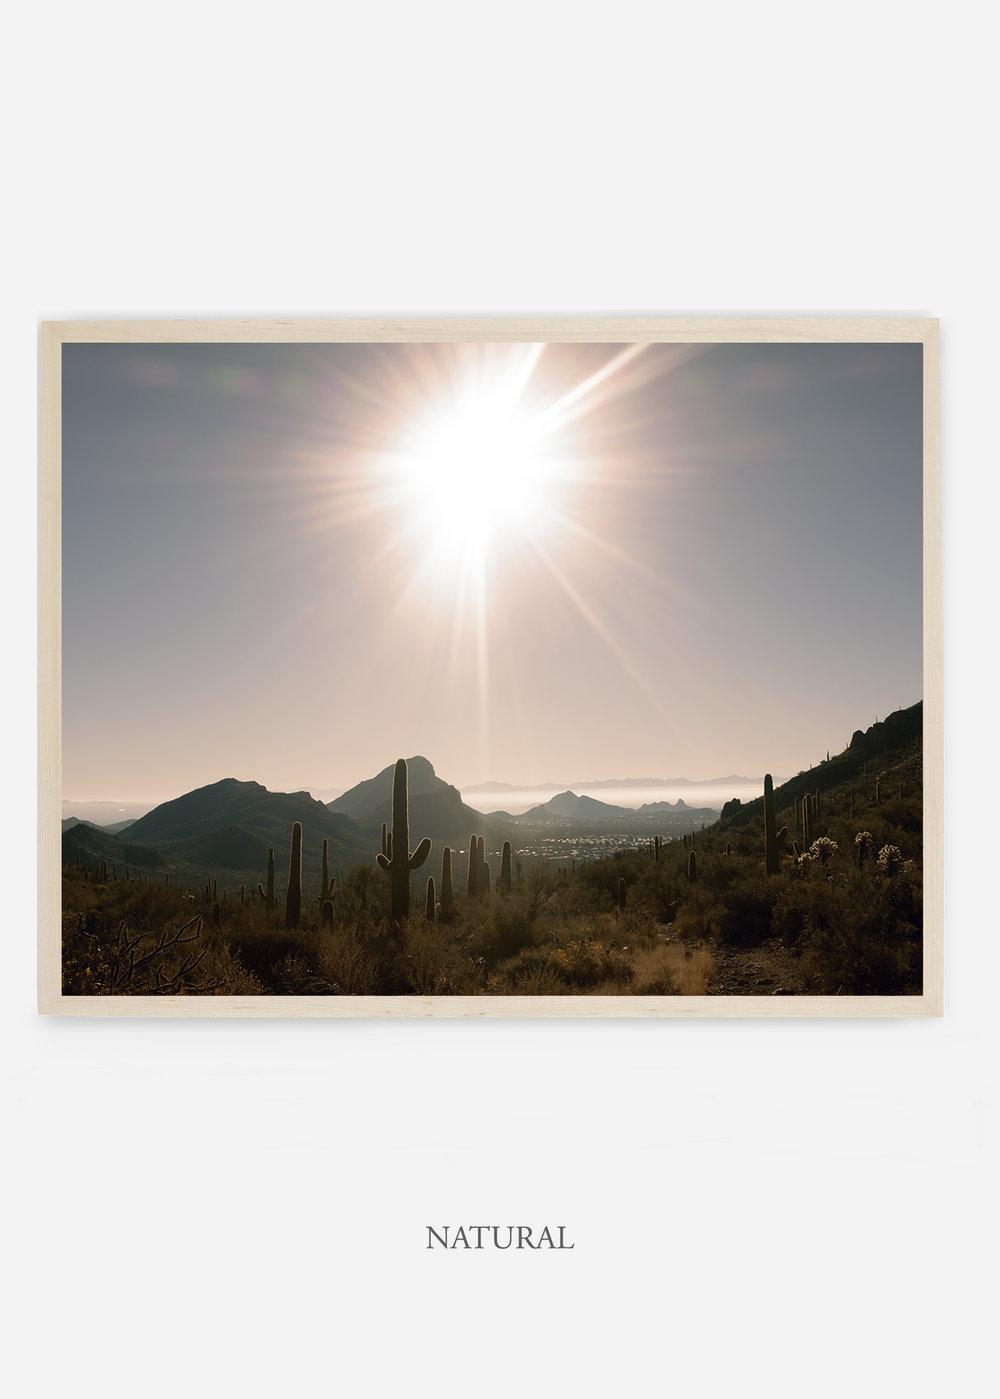 nomat_naturalframe-saguaroNo.15-wildercalifornia-art-wallart-cactusprint-homedecor-prints-arizona-botanical-artwork-interiordesign.jpg